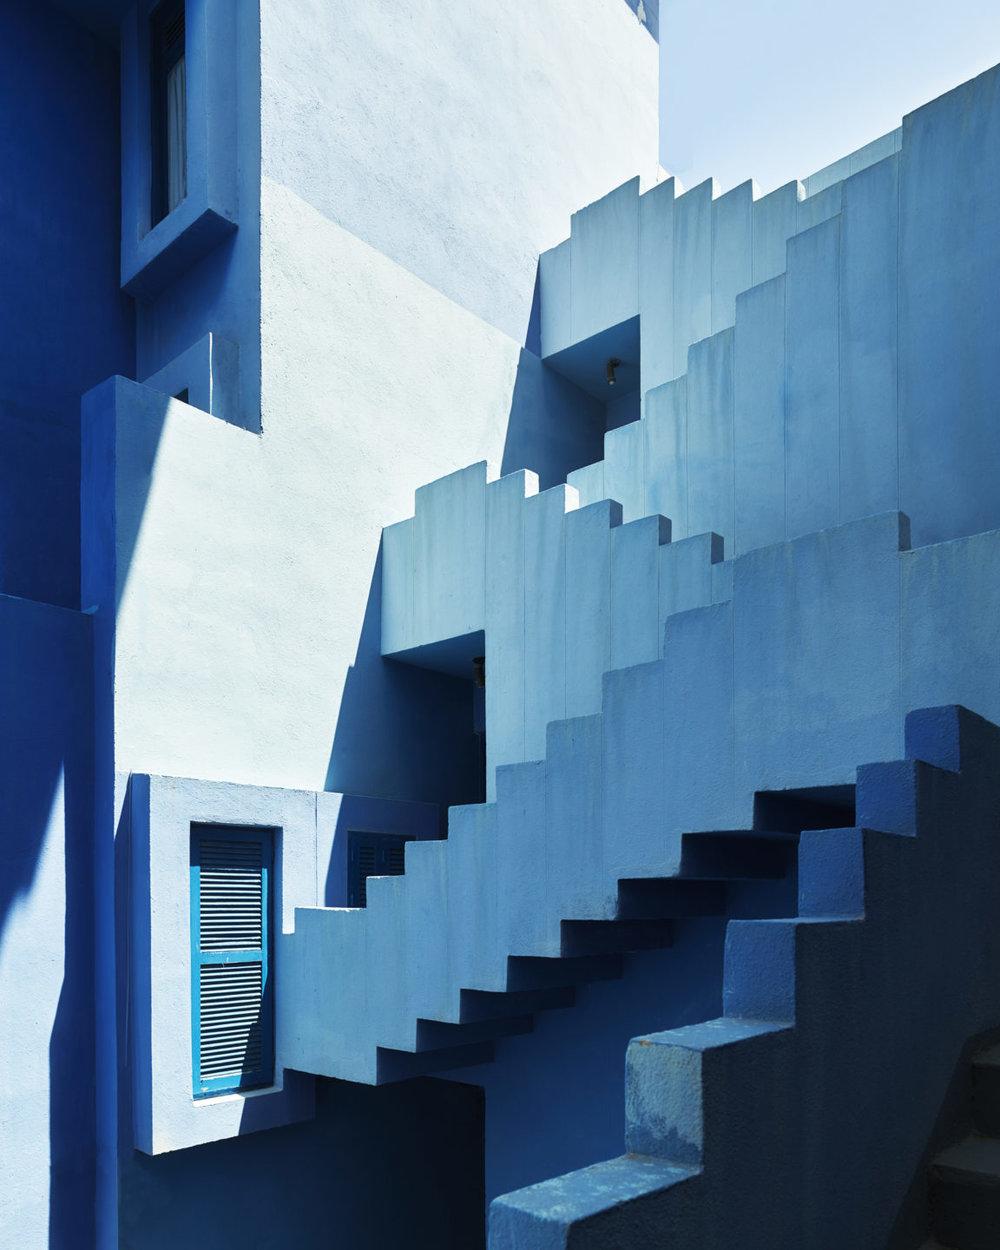 Muralla_Roja_Calpe_Spain_Ricardo_Bofill_Taller_Arquitectura_025-1152x1440.jpg